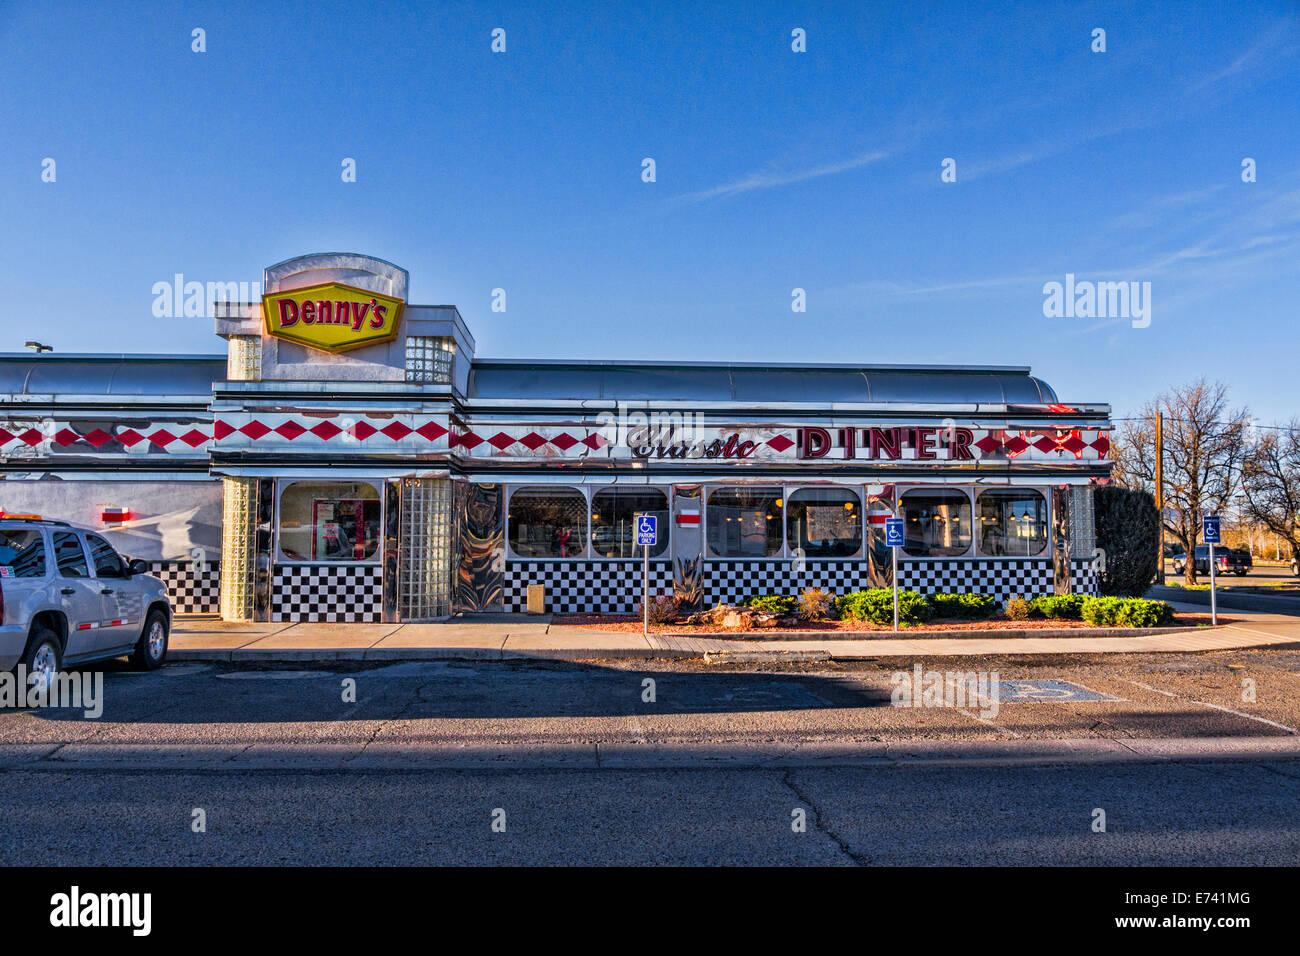 Denny's Classic Diner, Cortez, Colorado, USA. Photo Stock